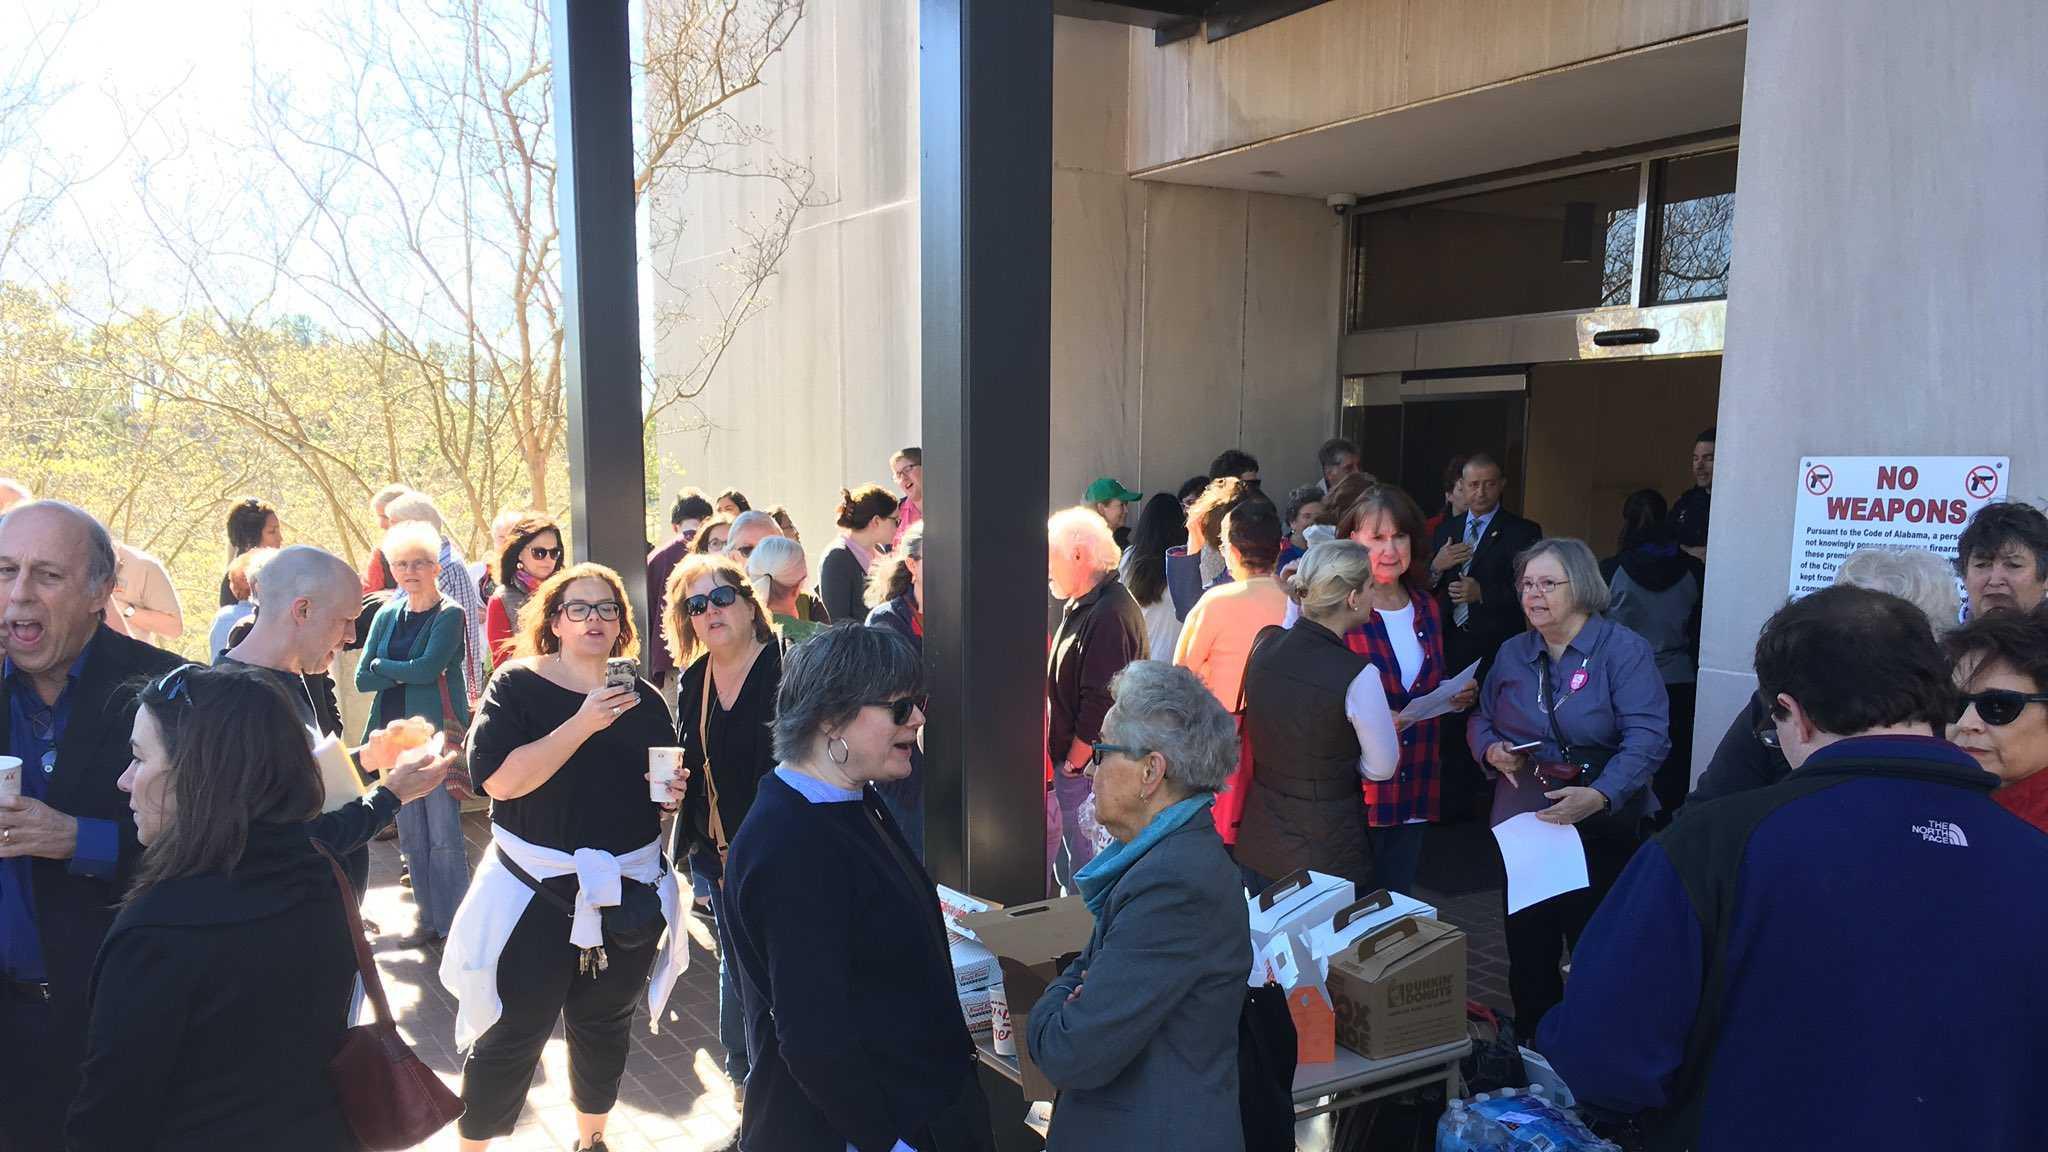 U.S. Rep. Gary Palmer hosts a Town Hall in Hoover, Alabama, Saturday, Feb. 25, 2017.